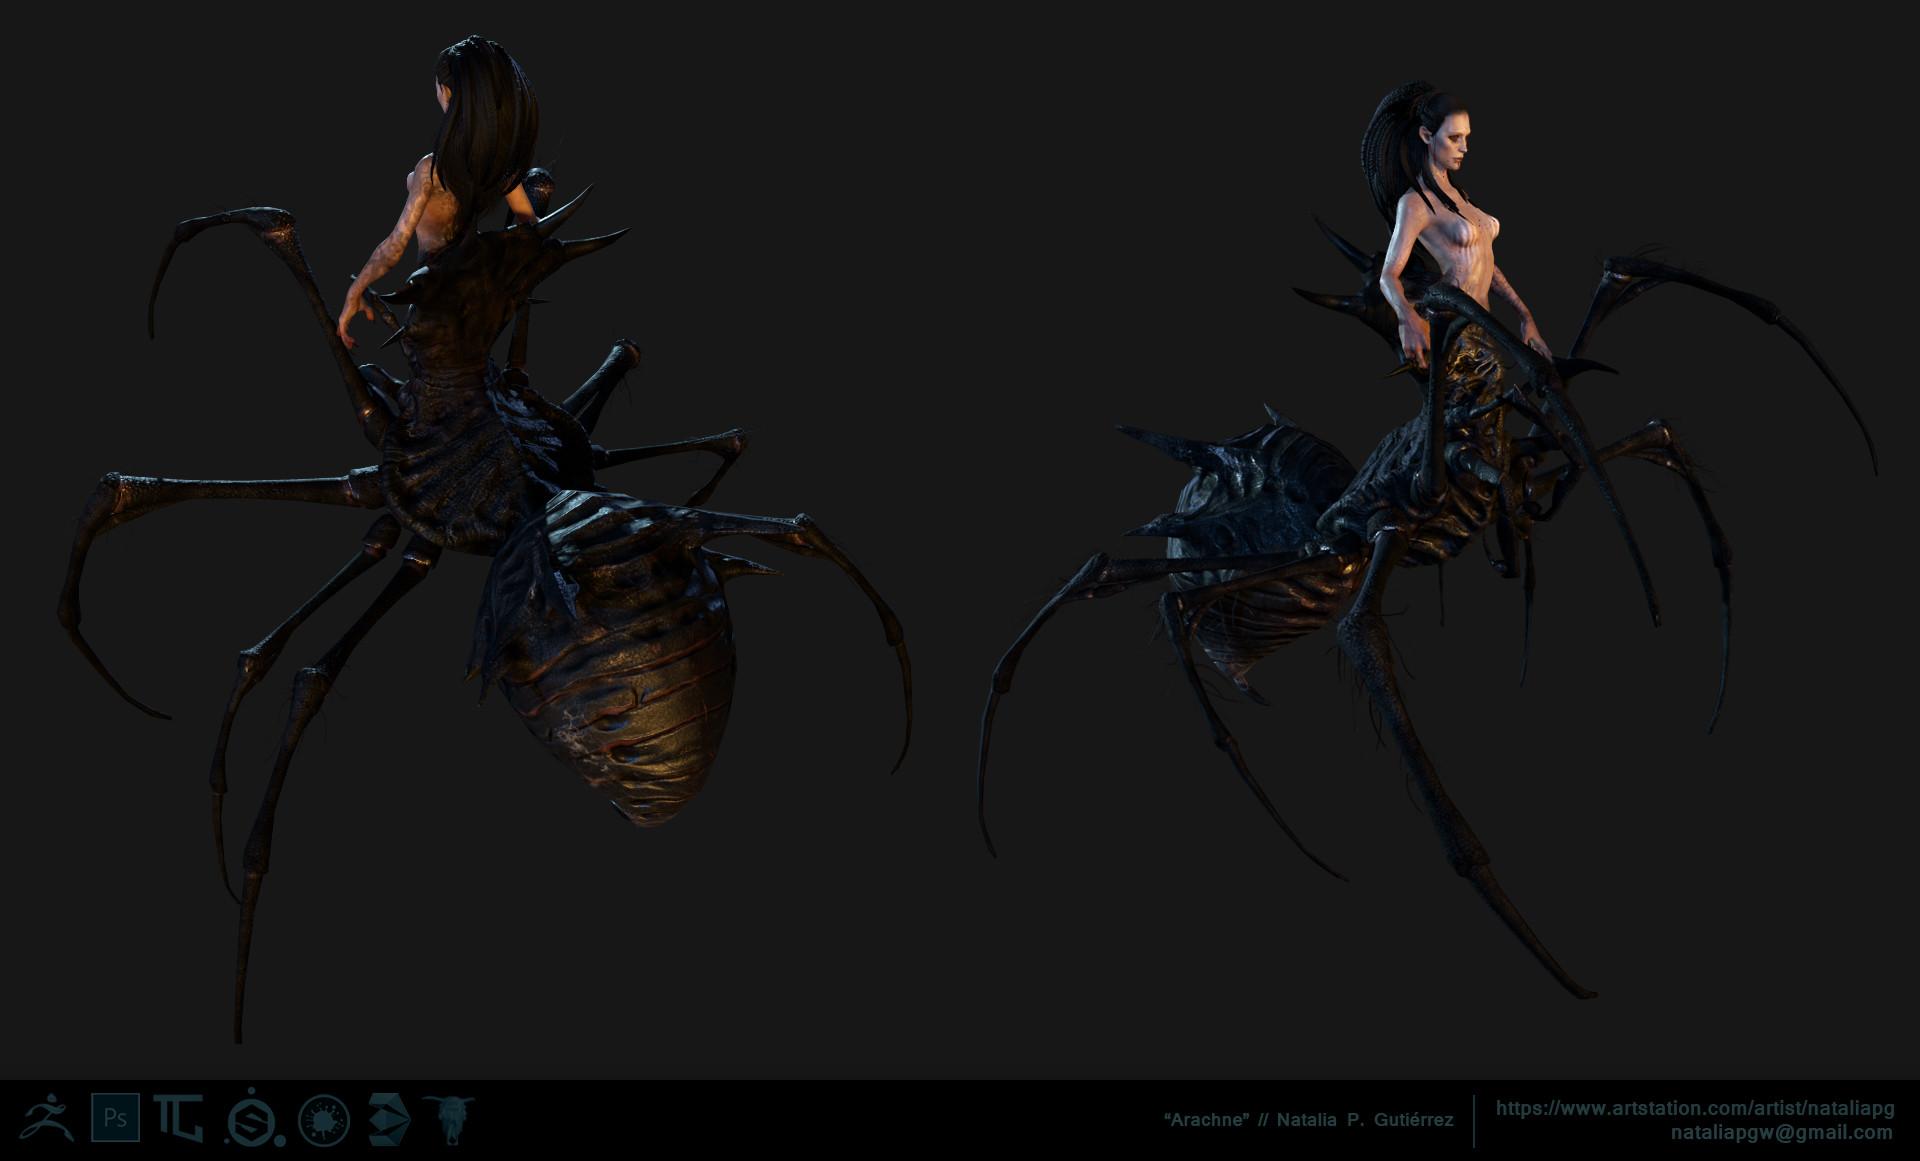 natalia-p-gutierrez-arachne-2.jpg